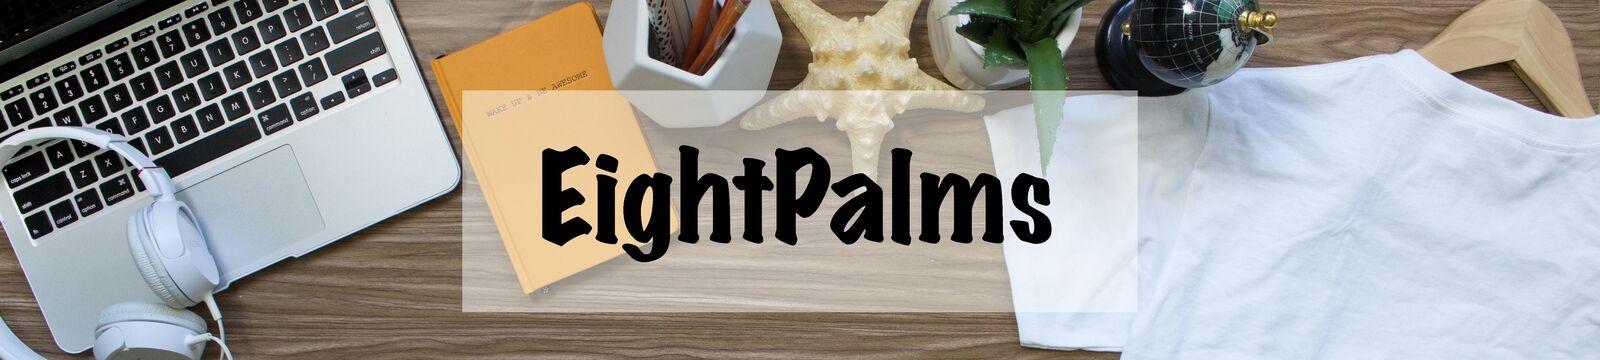 EightPalms